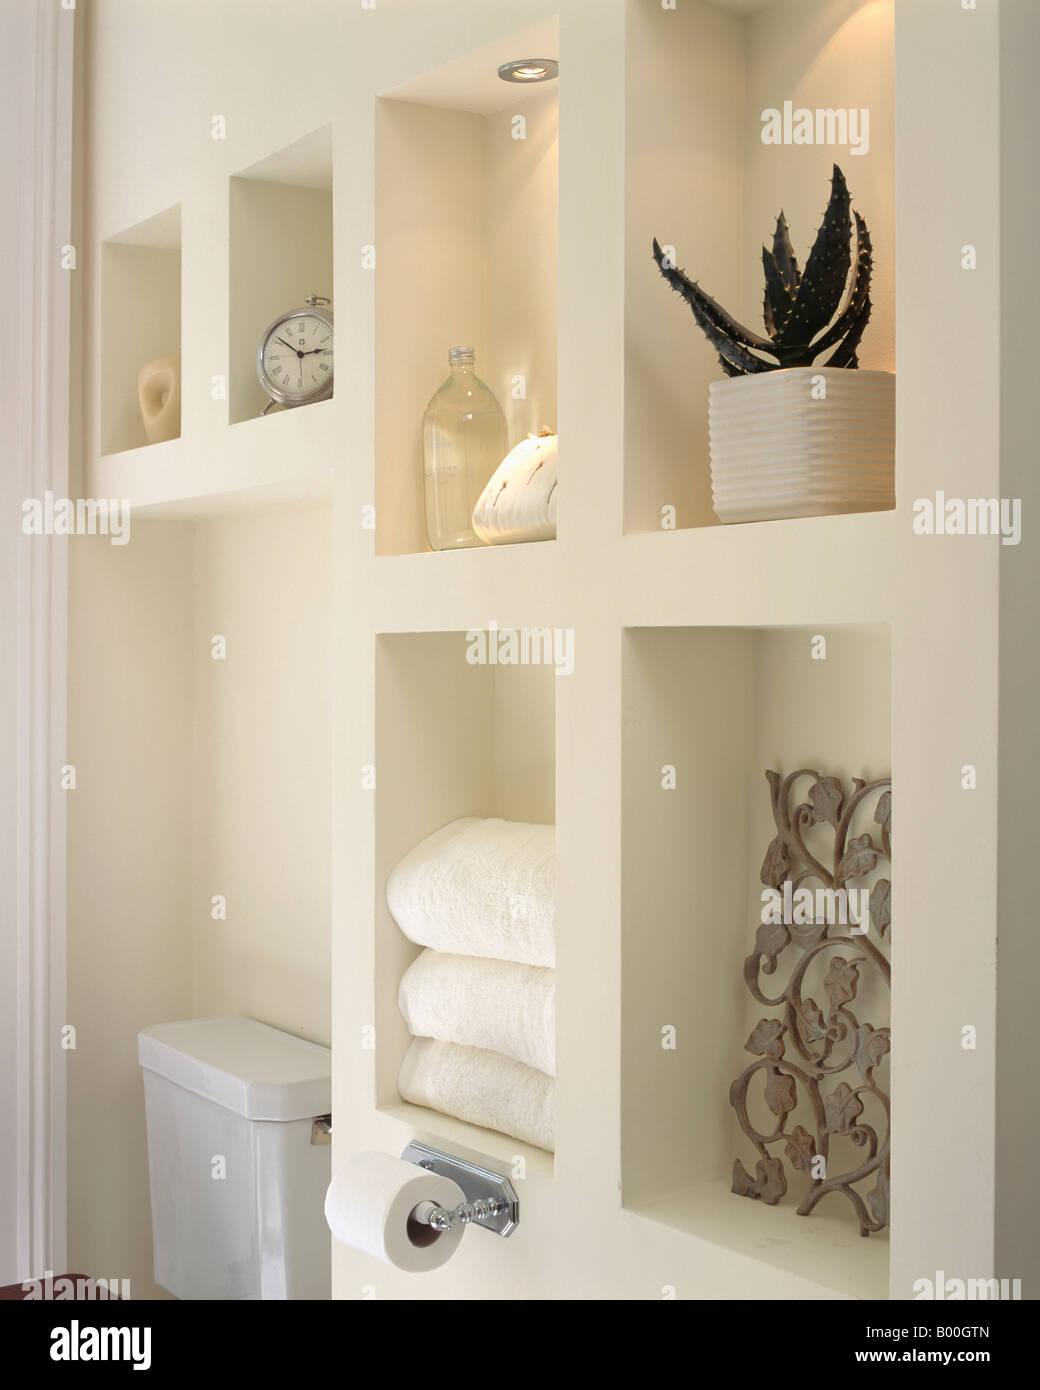 Close up of modern alcove shelving in white bathroom stock for Bathroom alcove shelves